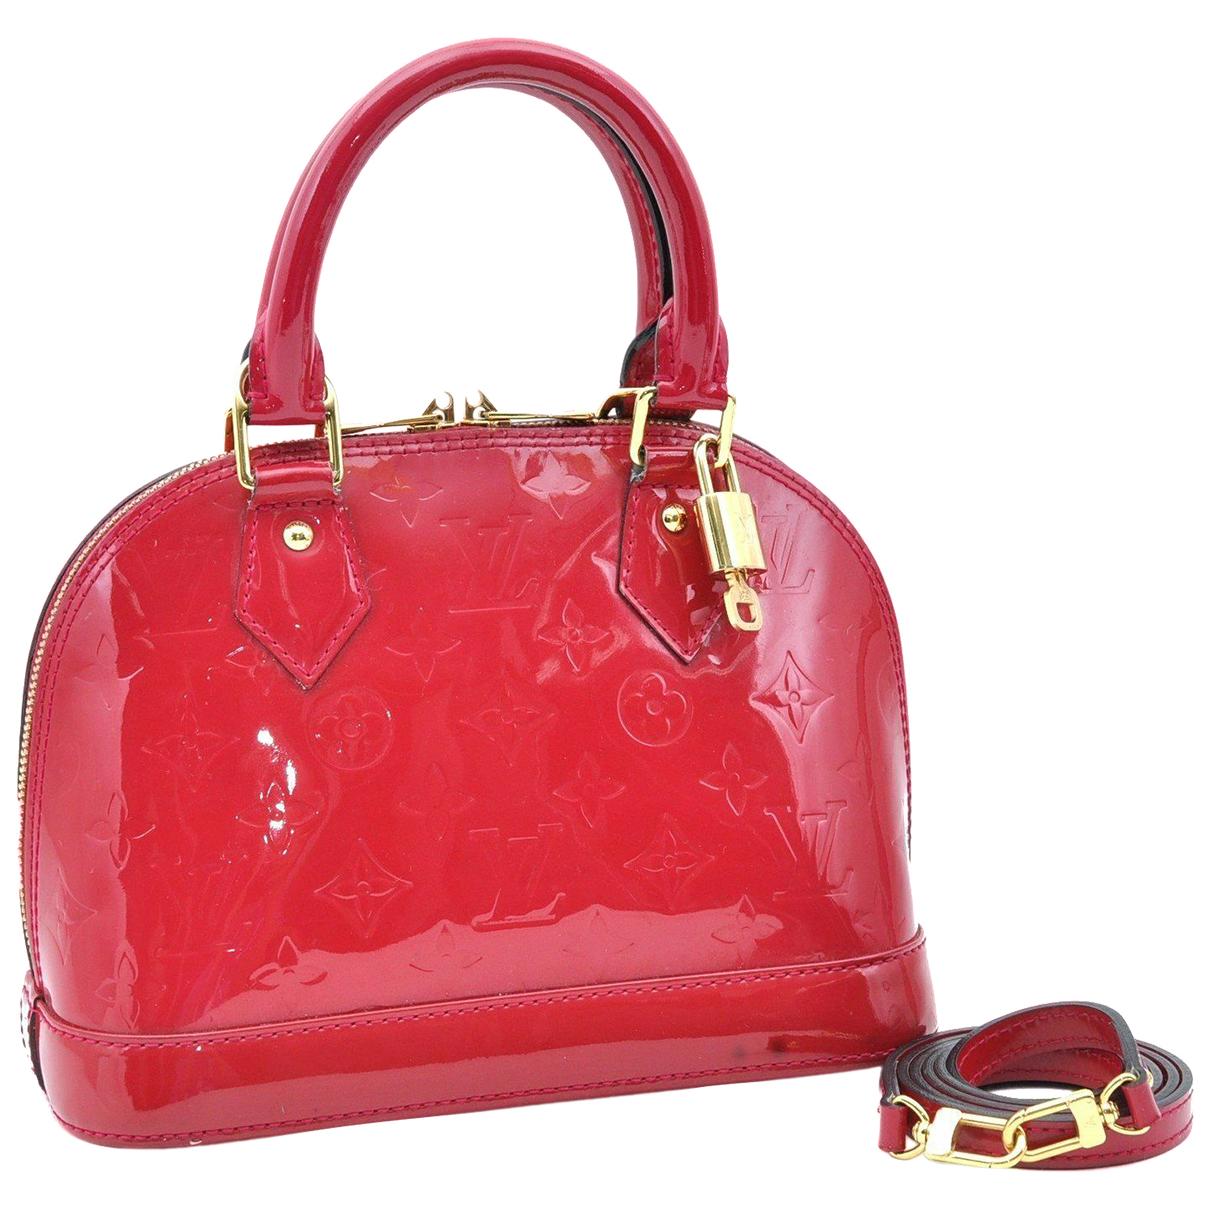 Louis Vuitton Alma BB Red Patent leather handbag for Women N